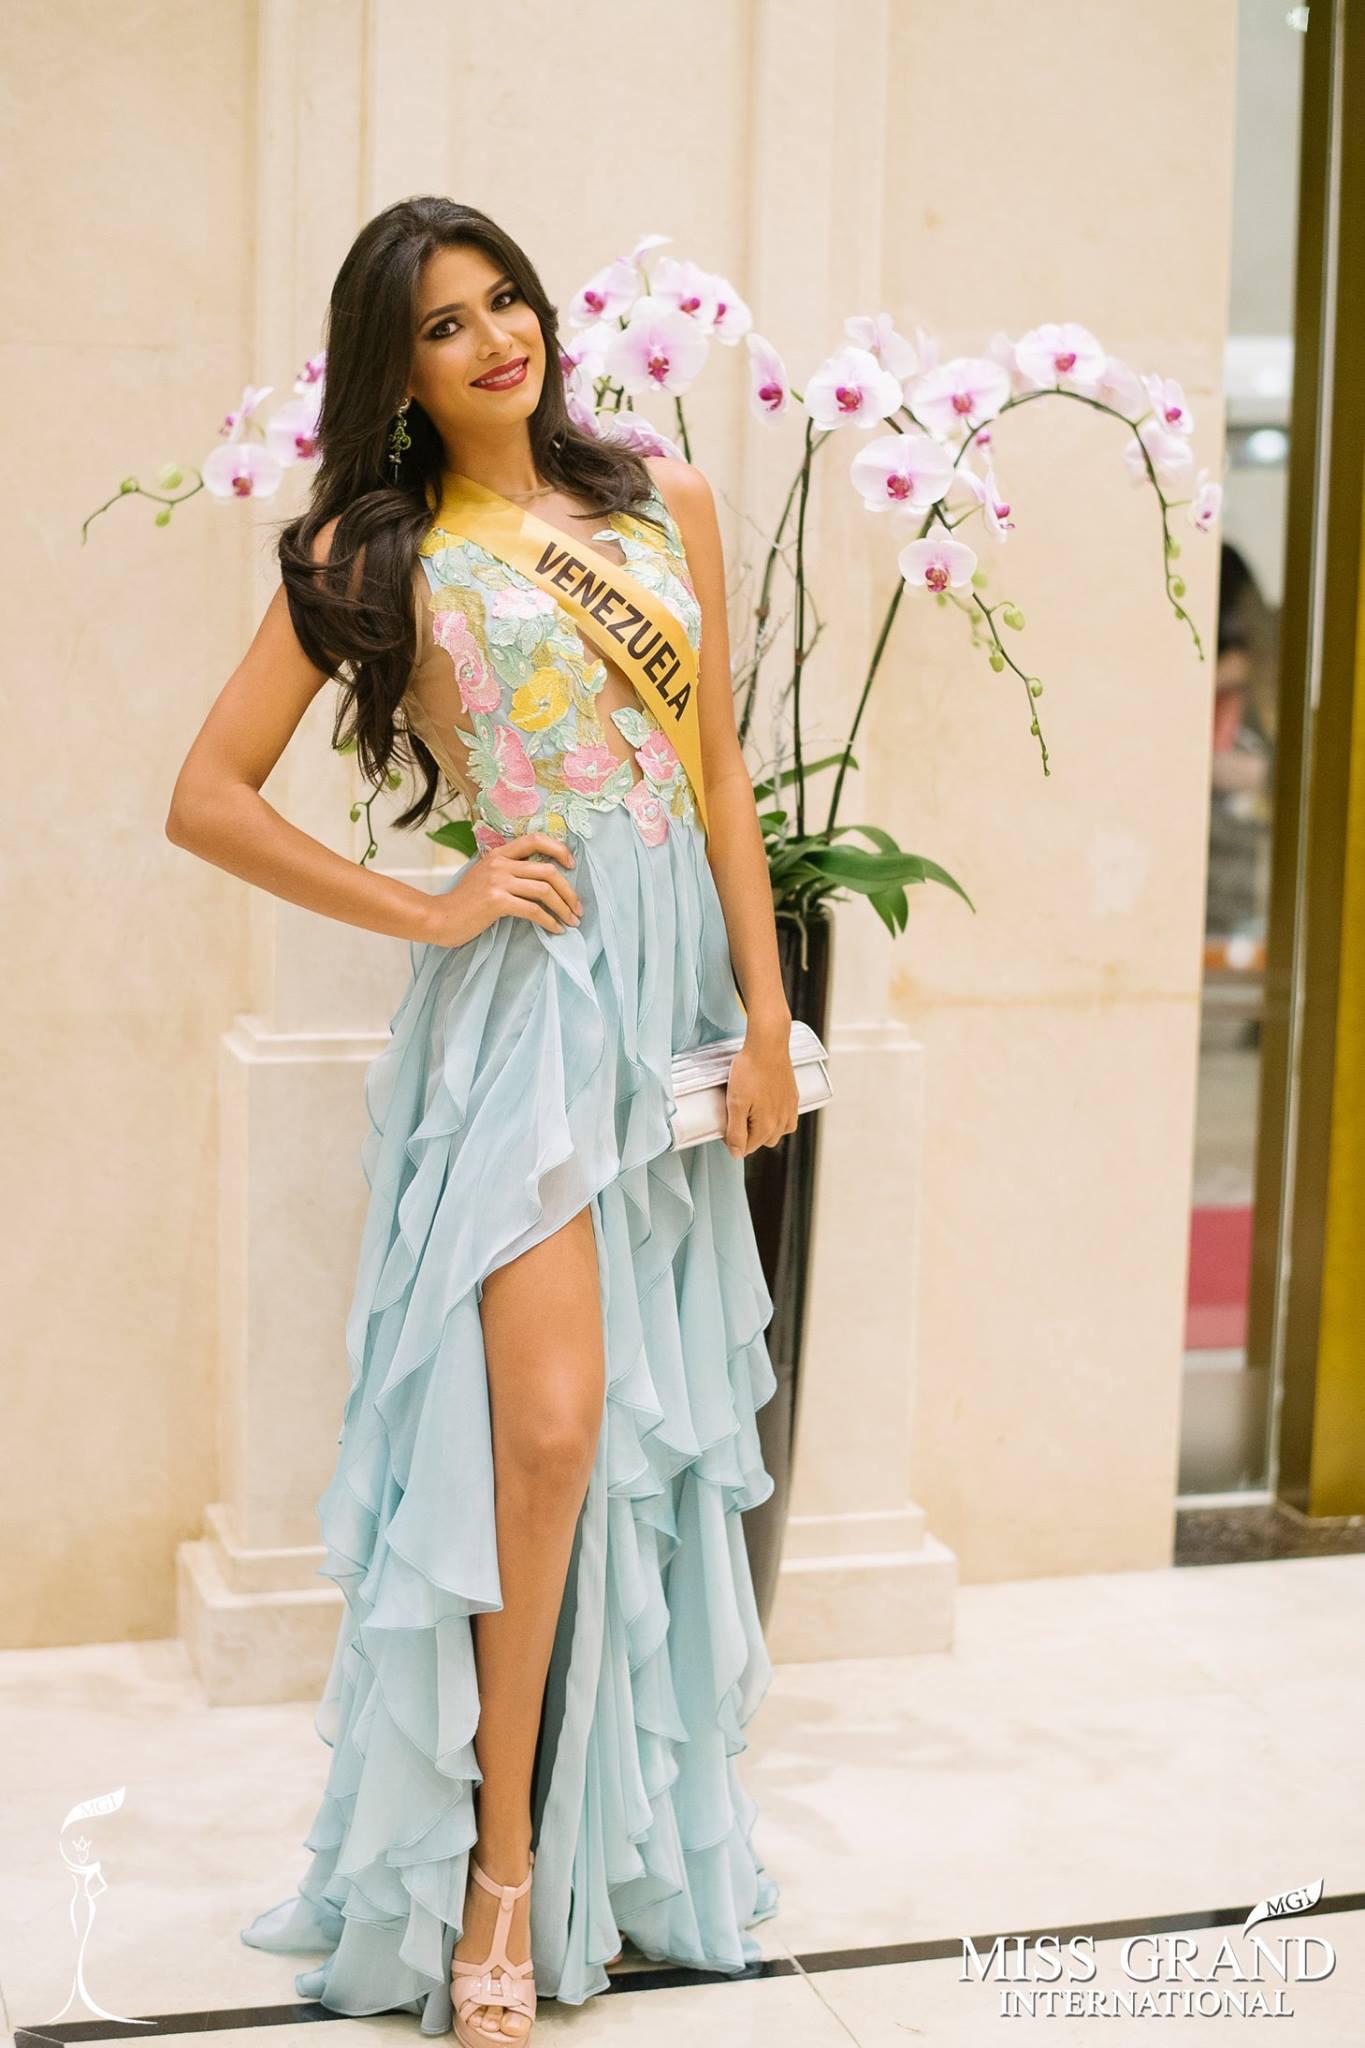 tulia aleman, 1st runner-up de miss grand international 2017. - Página 14 Eed91399-897a-404f-afe3-eb031b485931